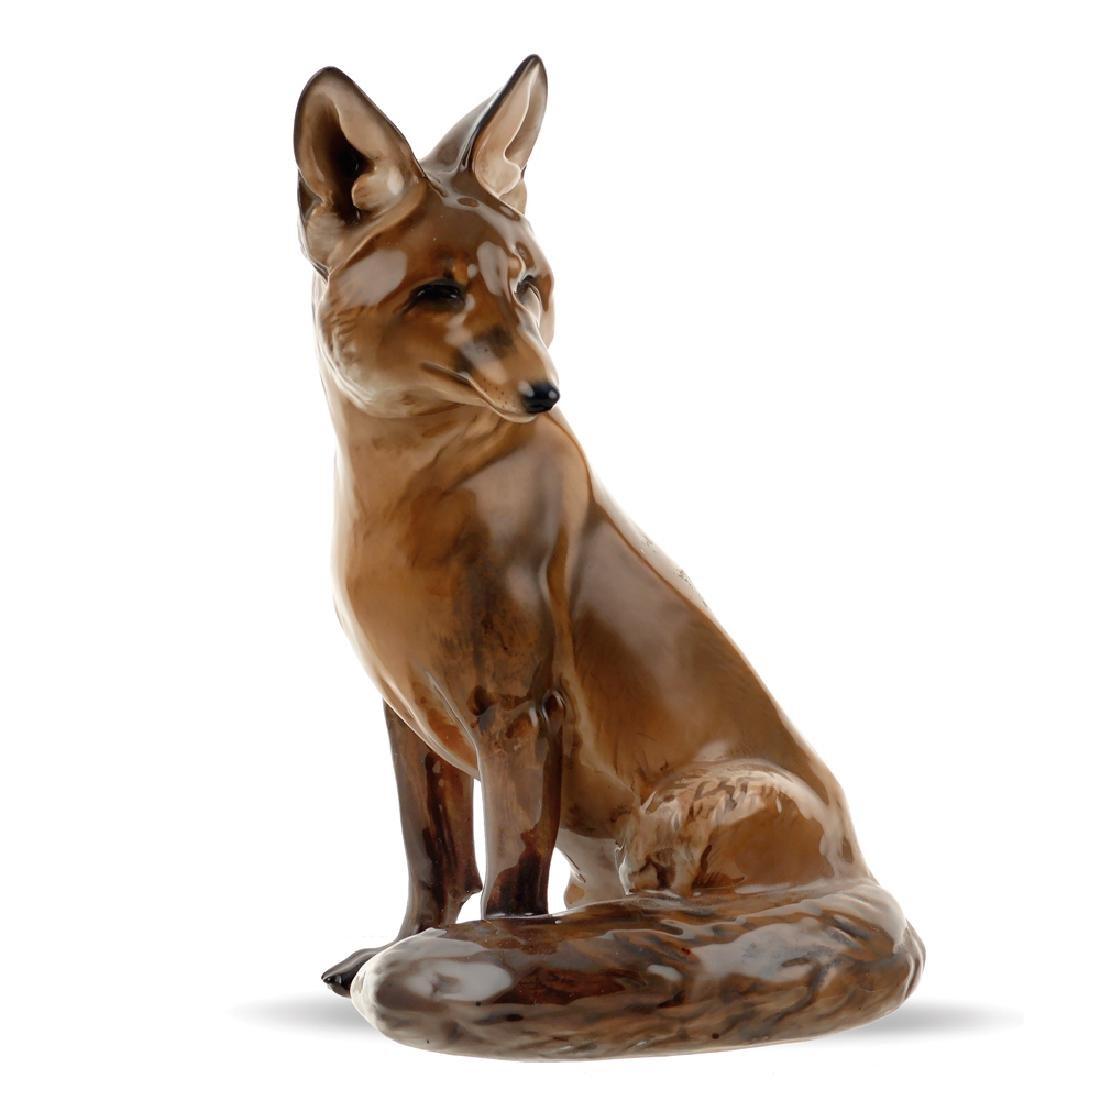 A porcelain fox Germany 20th century 24x16x11 cm.